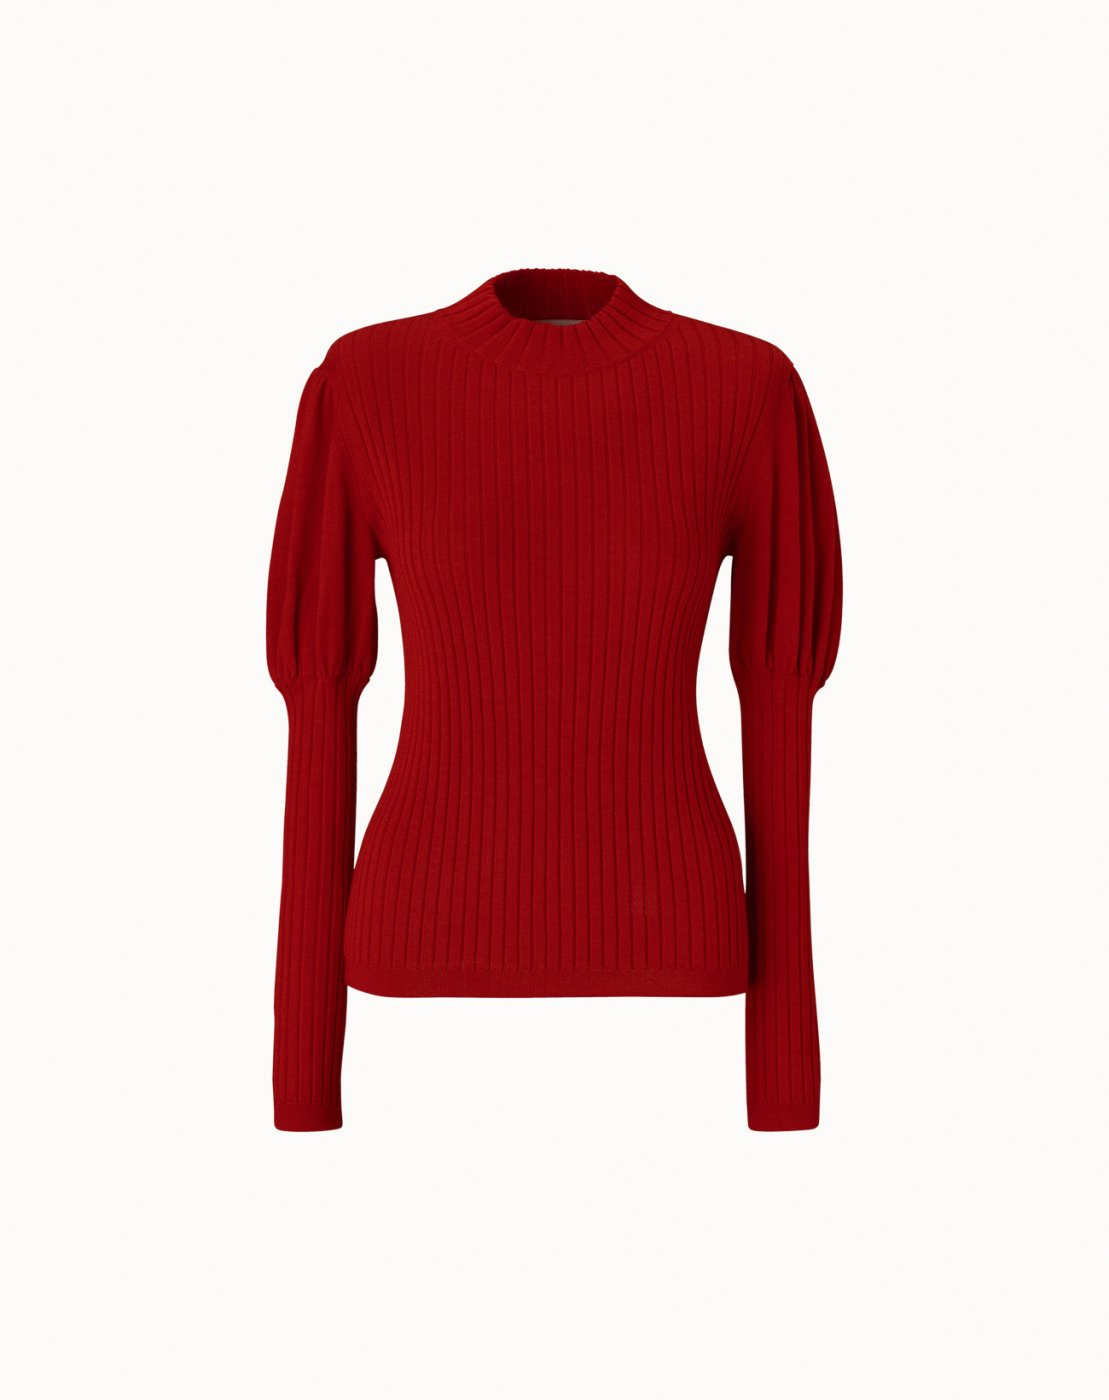 leur logette - Cashmere Silk Rib Top - Red